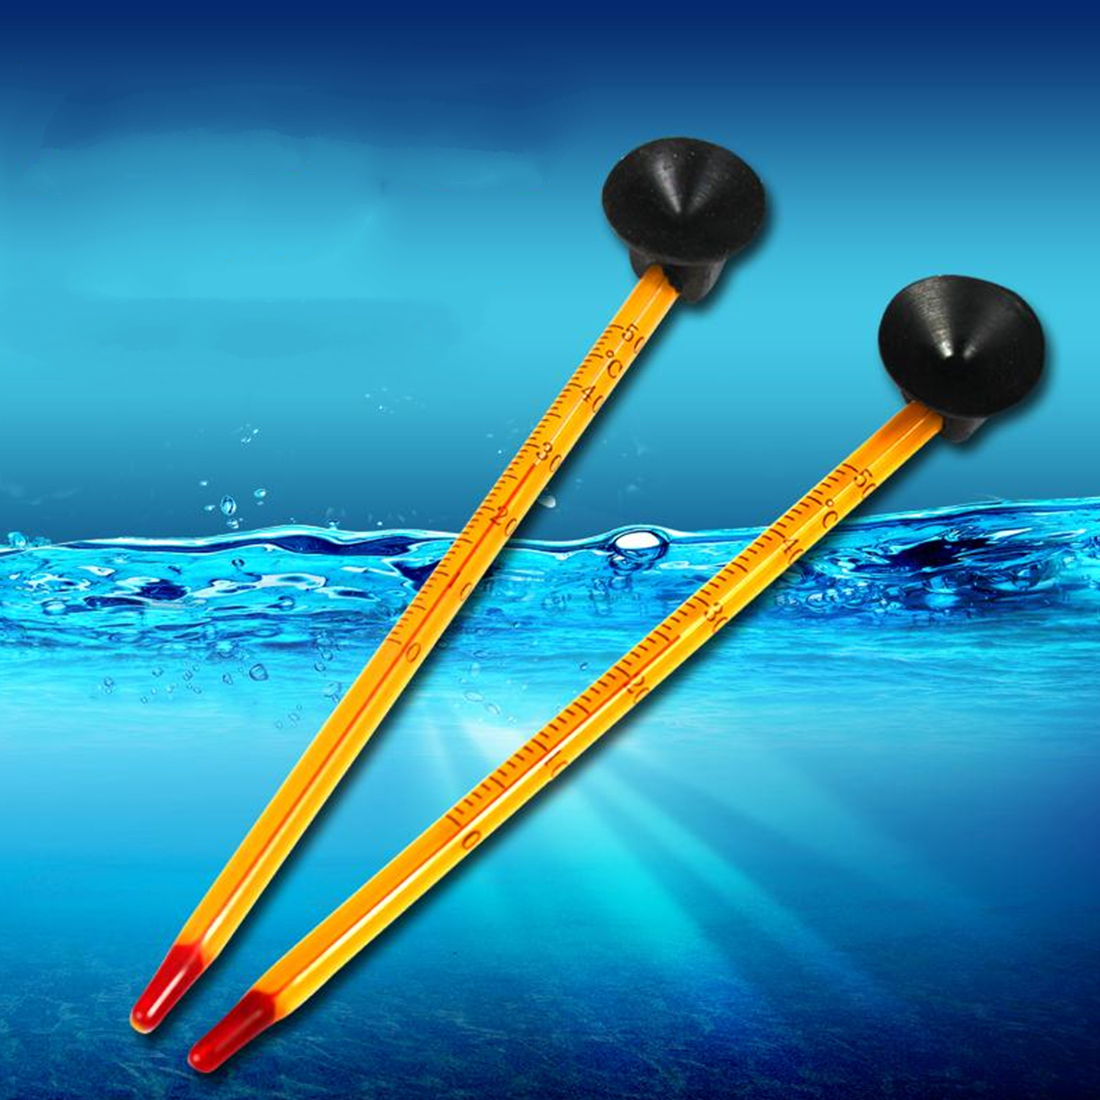 Aquarium Submersible Glass Thermometer With Suction Hydrometer Fish Tank Tools Aquarium Accessories Supplies Tools